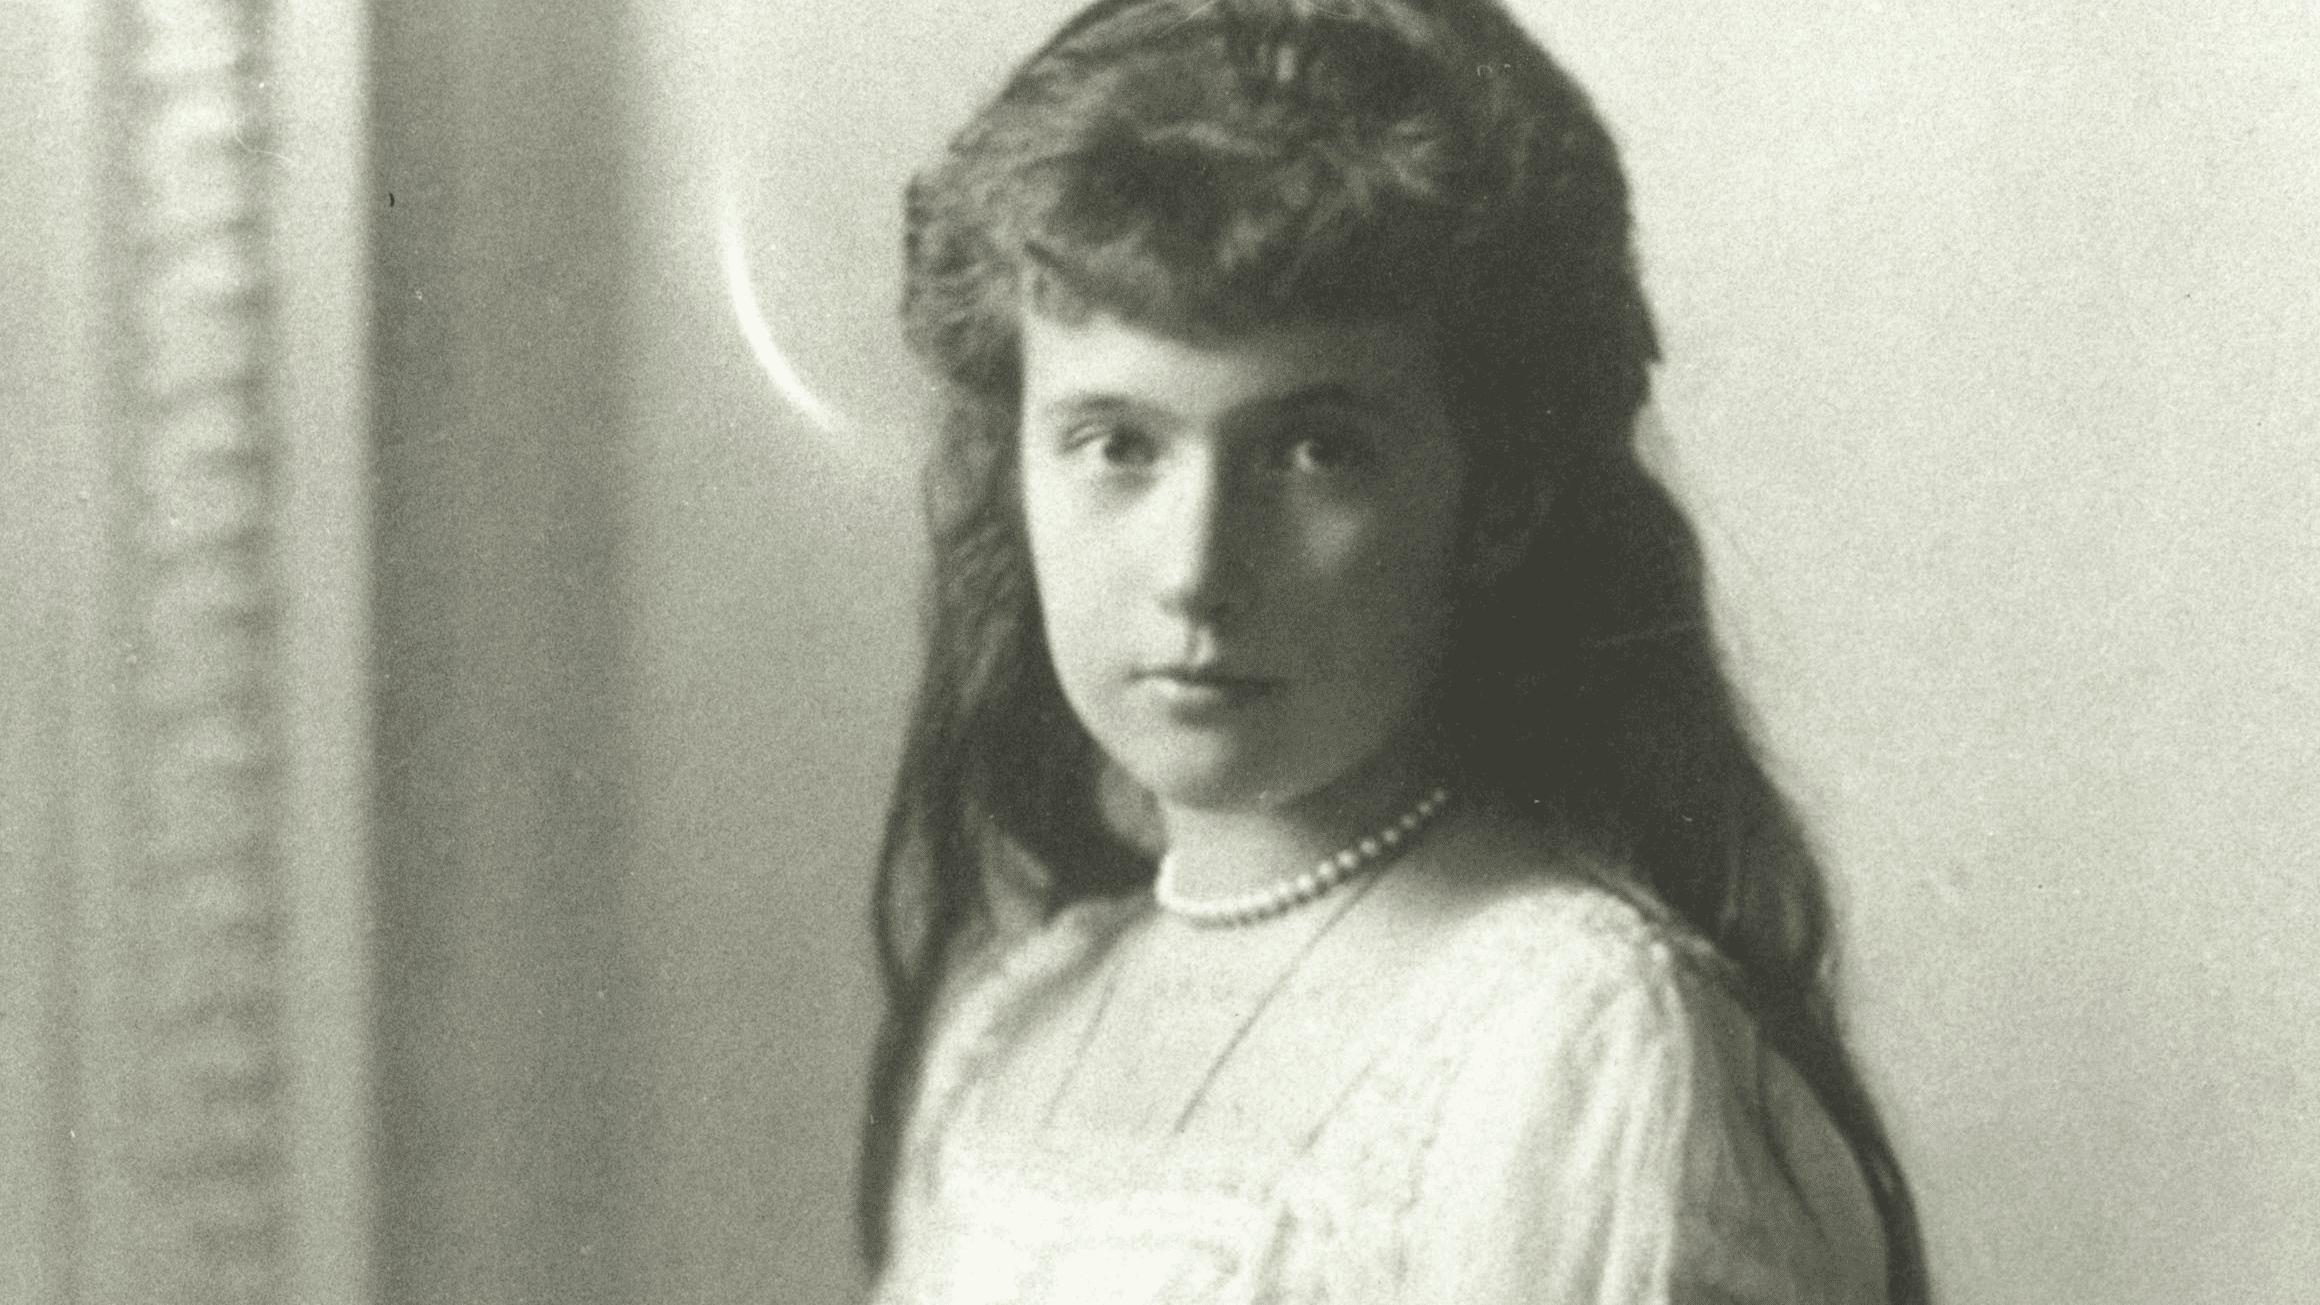 Alexandra África Not English Porn anastasia romanov: the mystery of her life and death